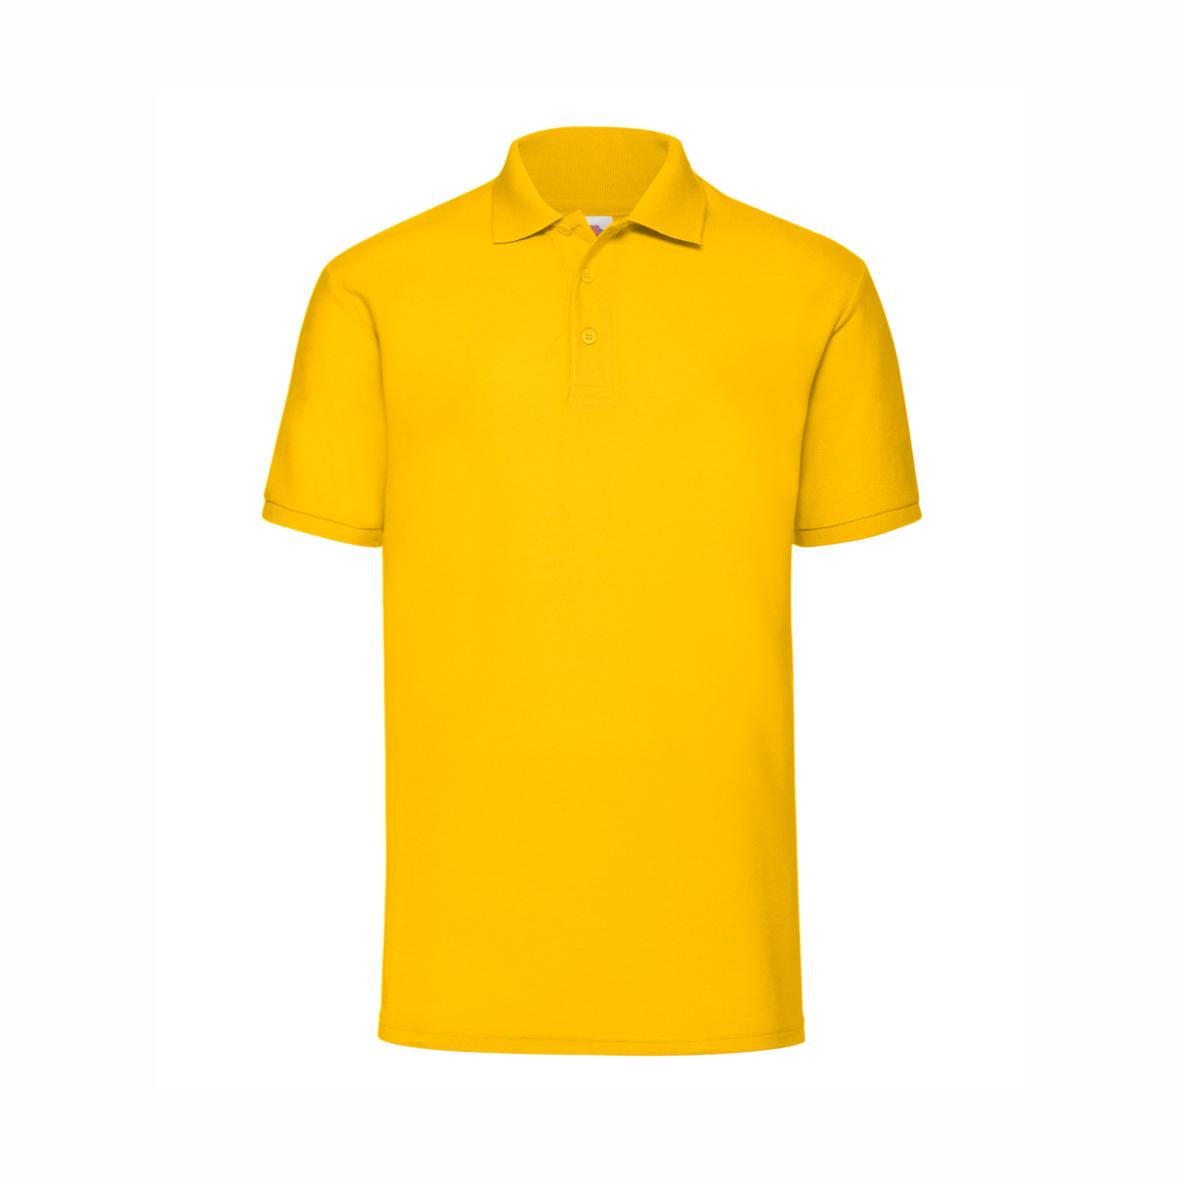 Cheap Custom Polo Shirts Uk